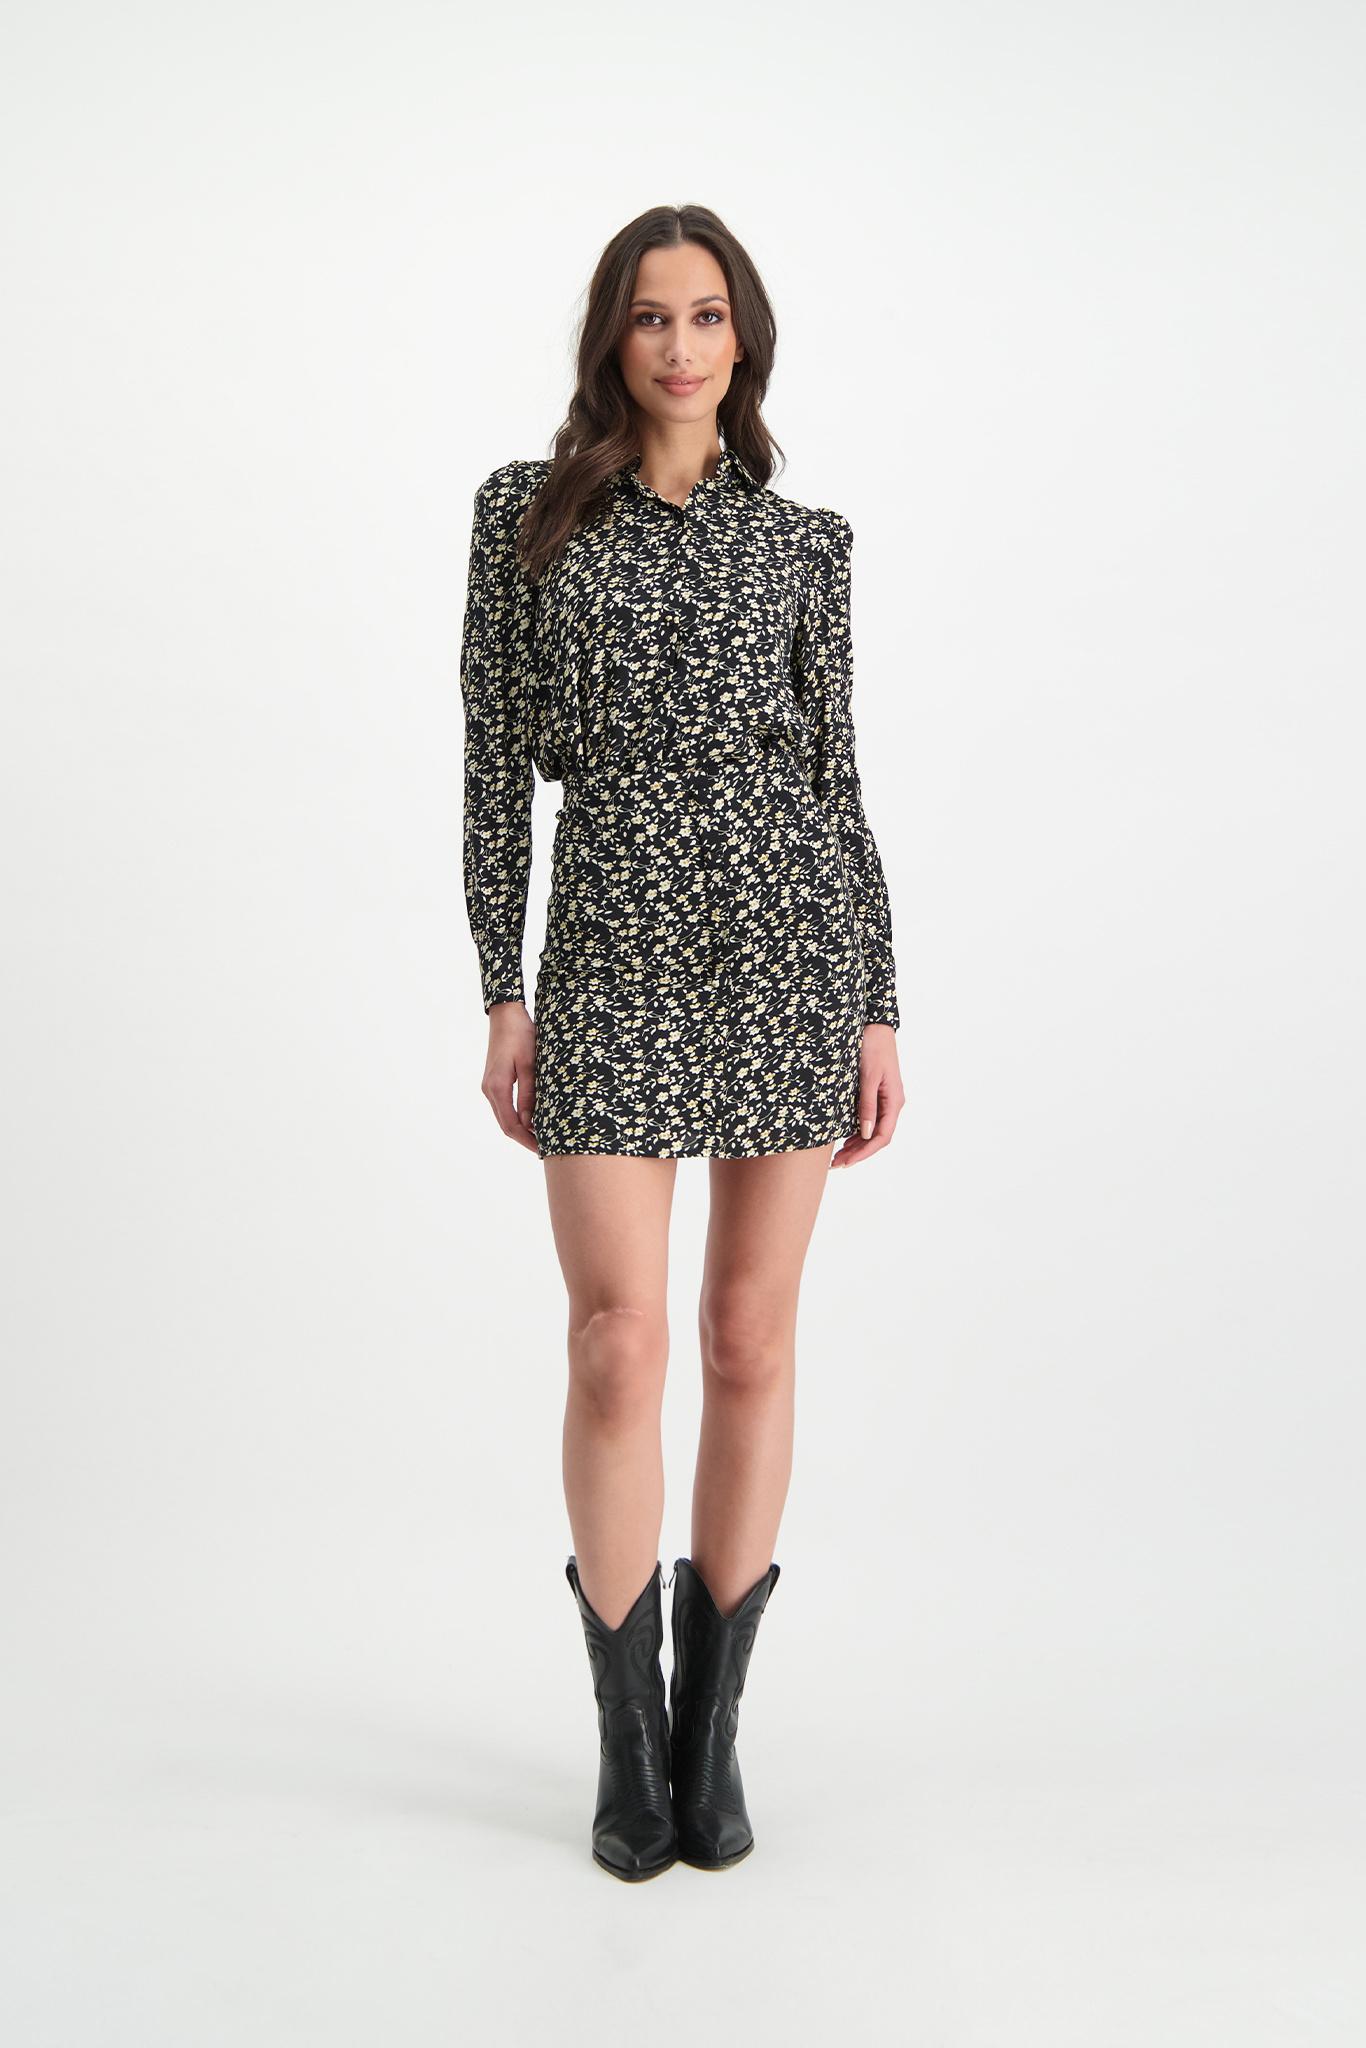 Lofty Manner Black Floral Print Skirt Marly